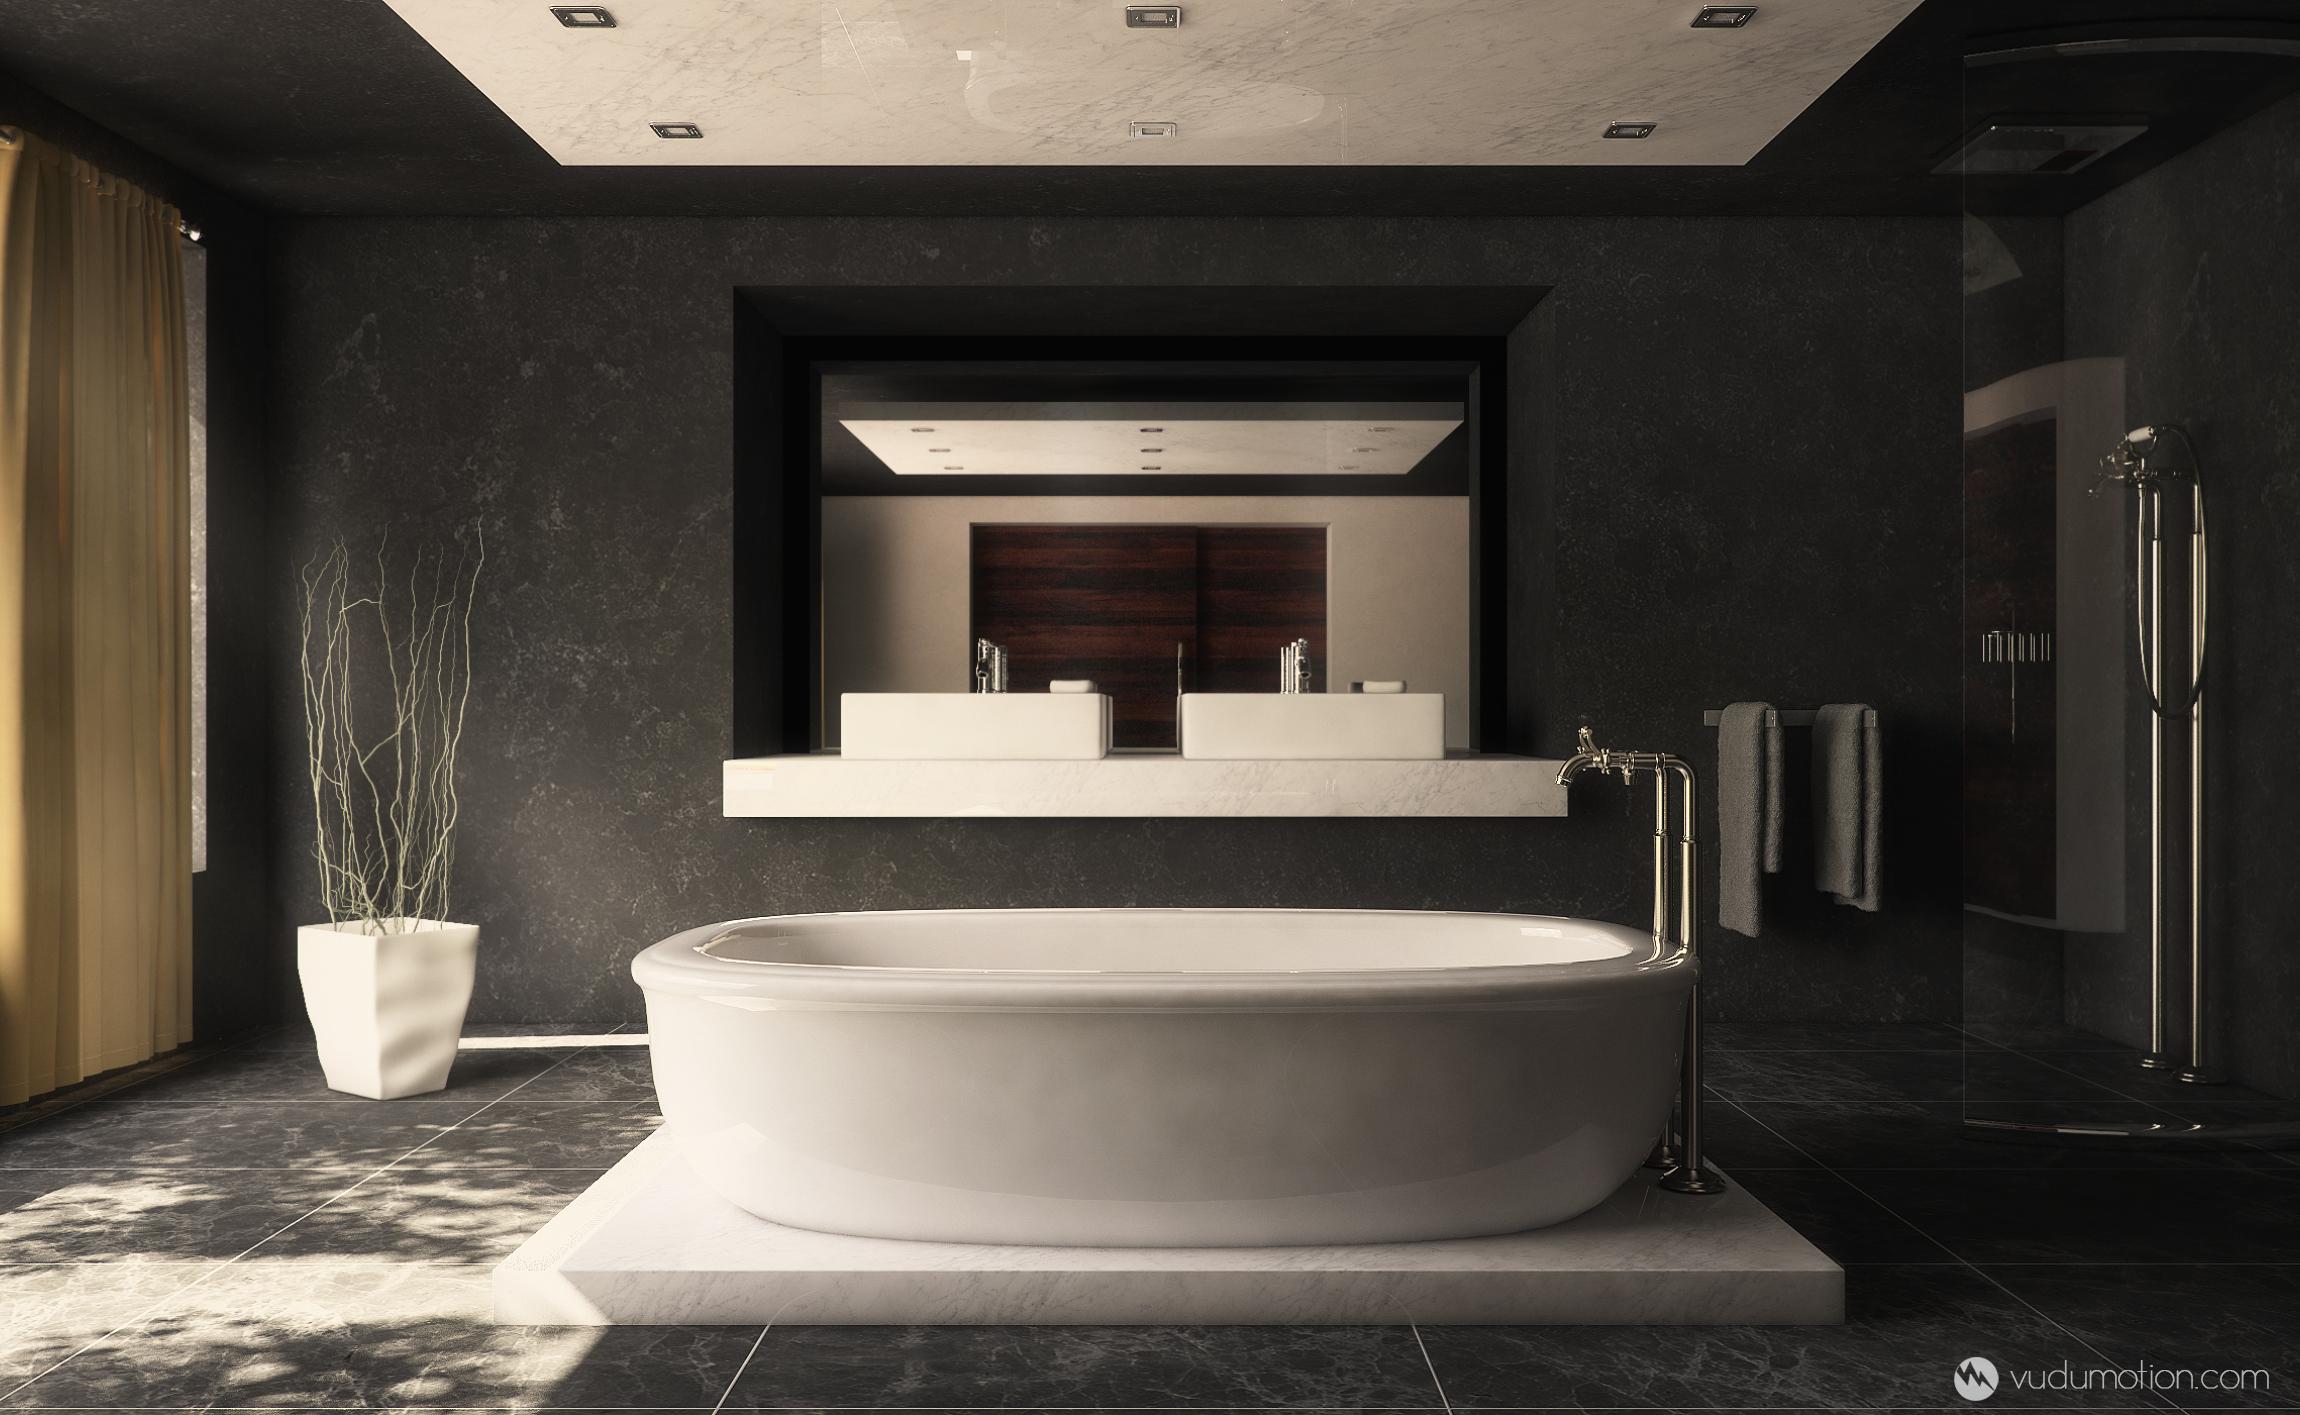 Contemporary Bathroom By Vudumotion On Deviantart